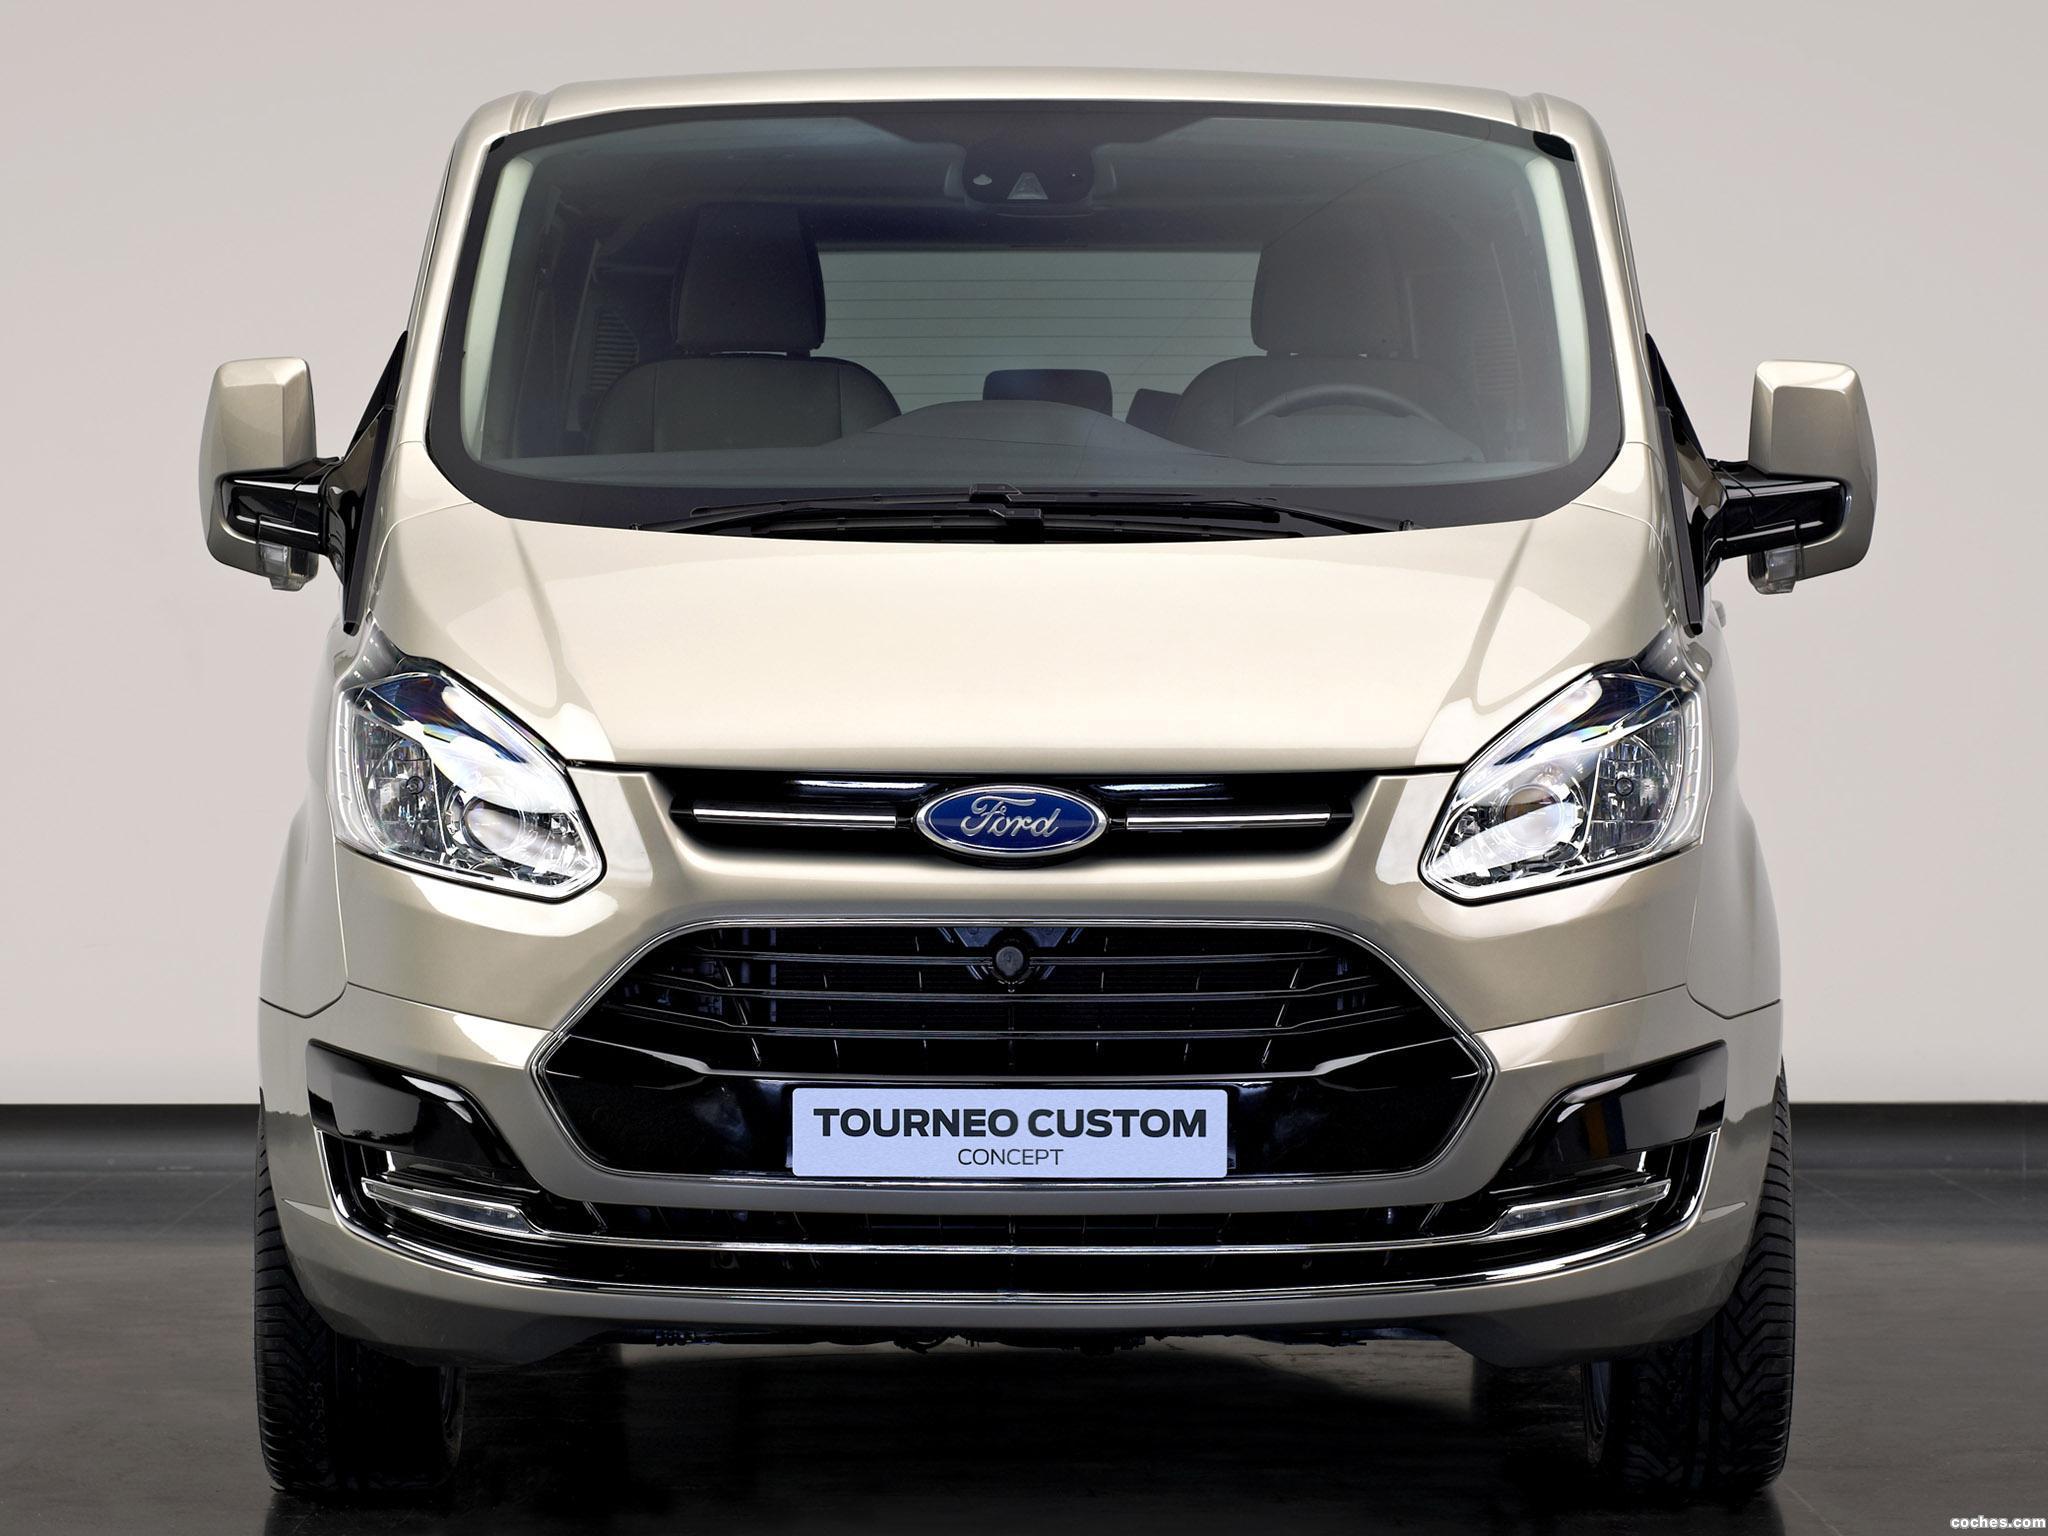 Foto 2 de Ford Tourneo Custom Concept 2012